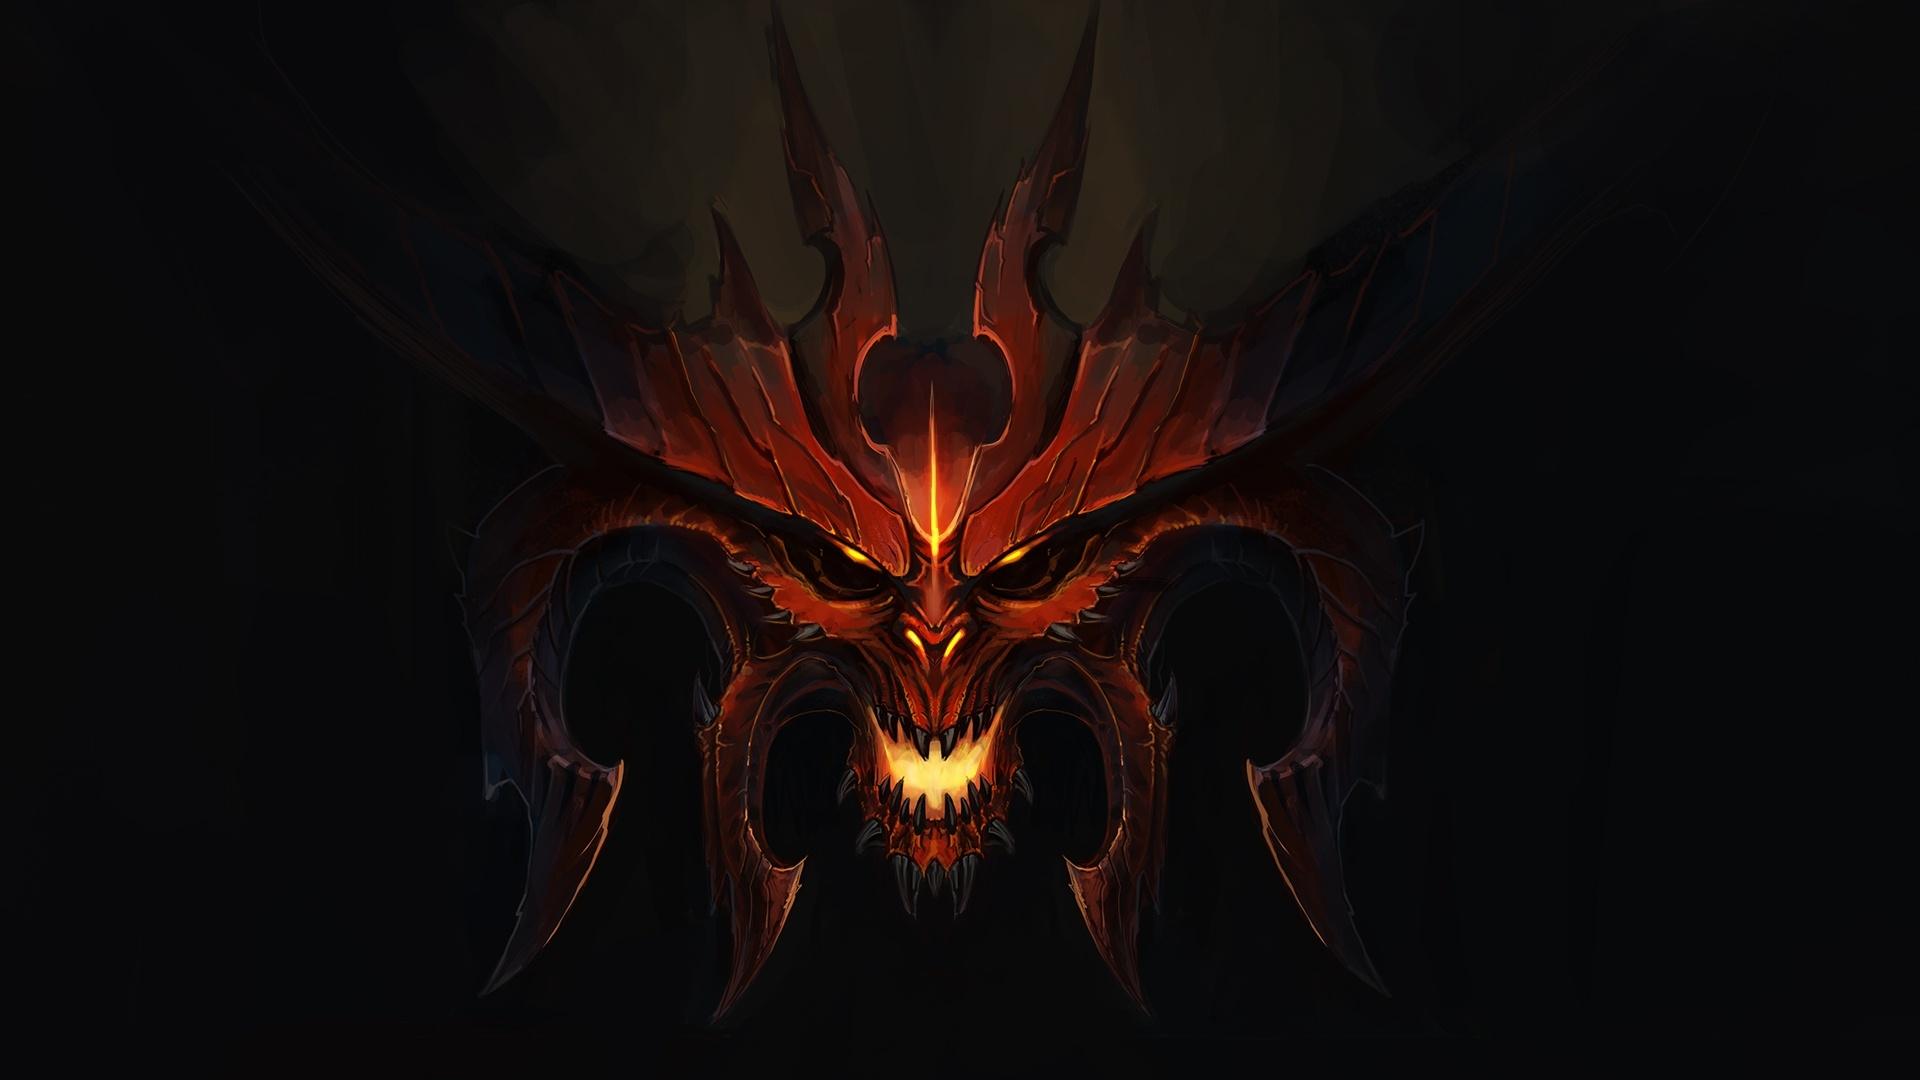 Diablo Wallpaper, HD Games 4K Wallpapers, Images, Photos ...